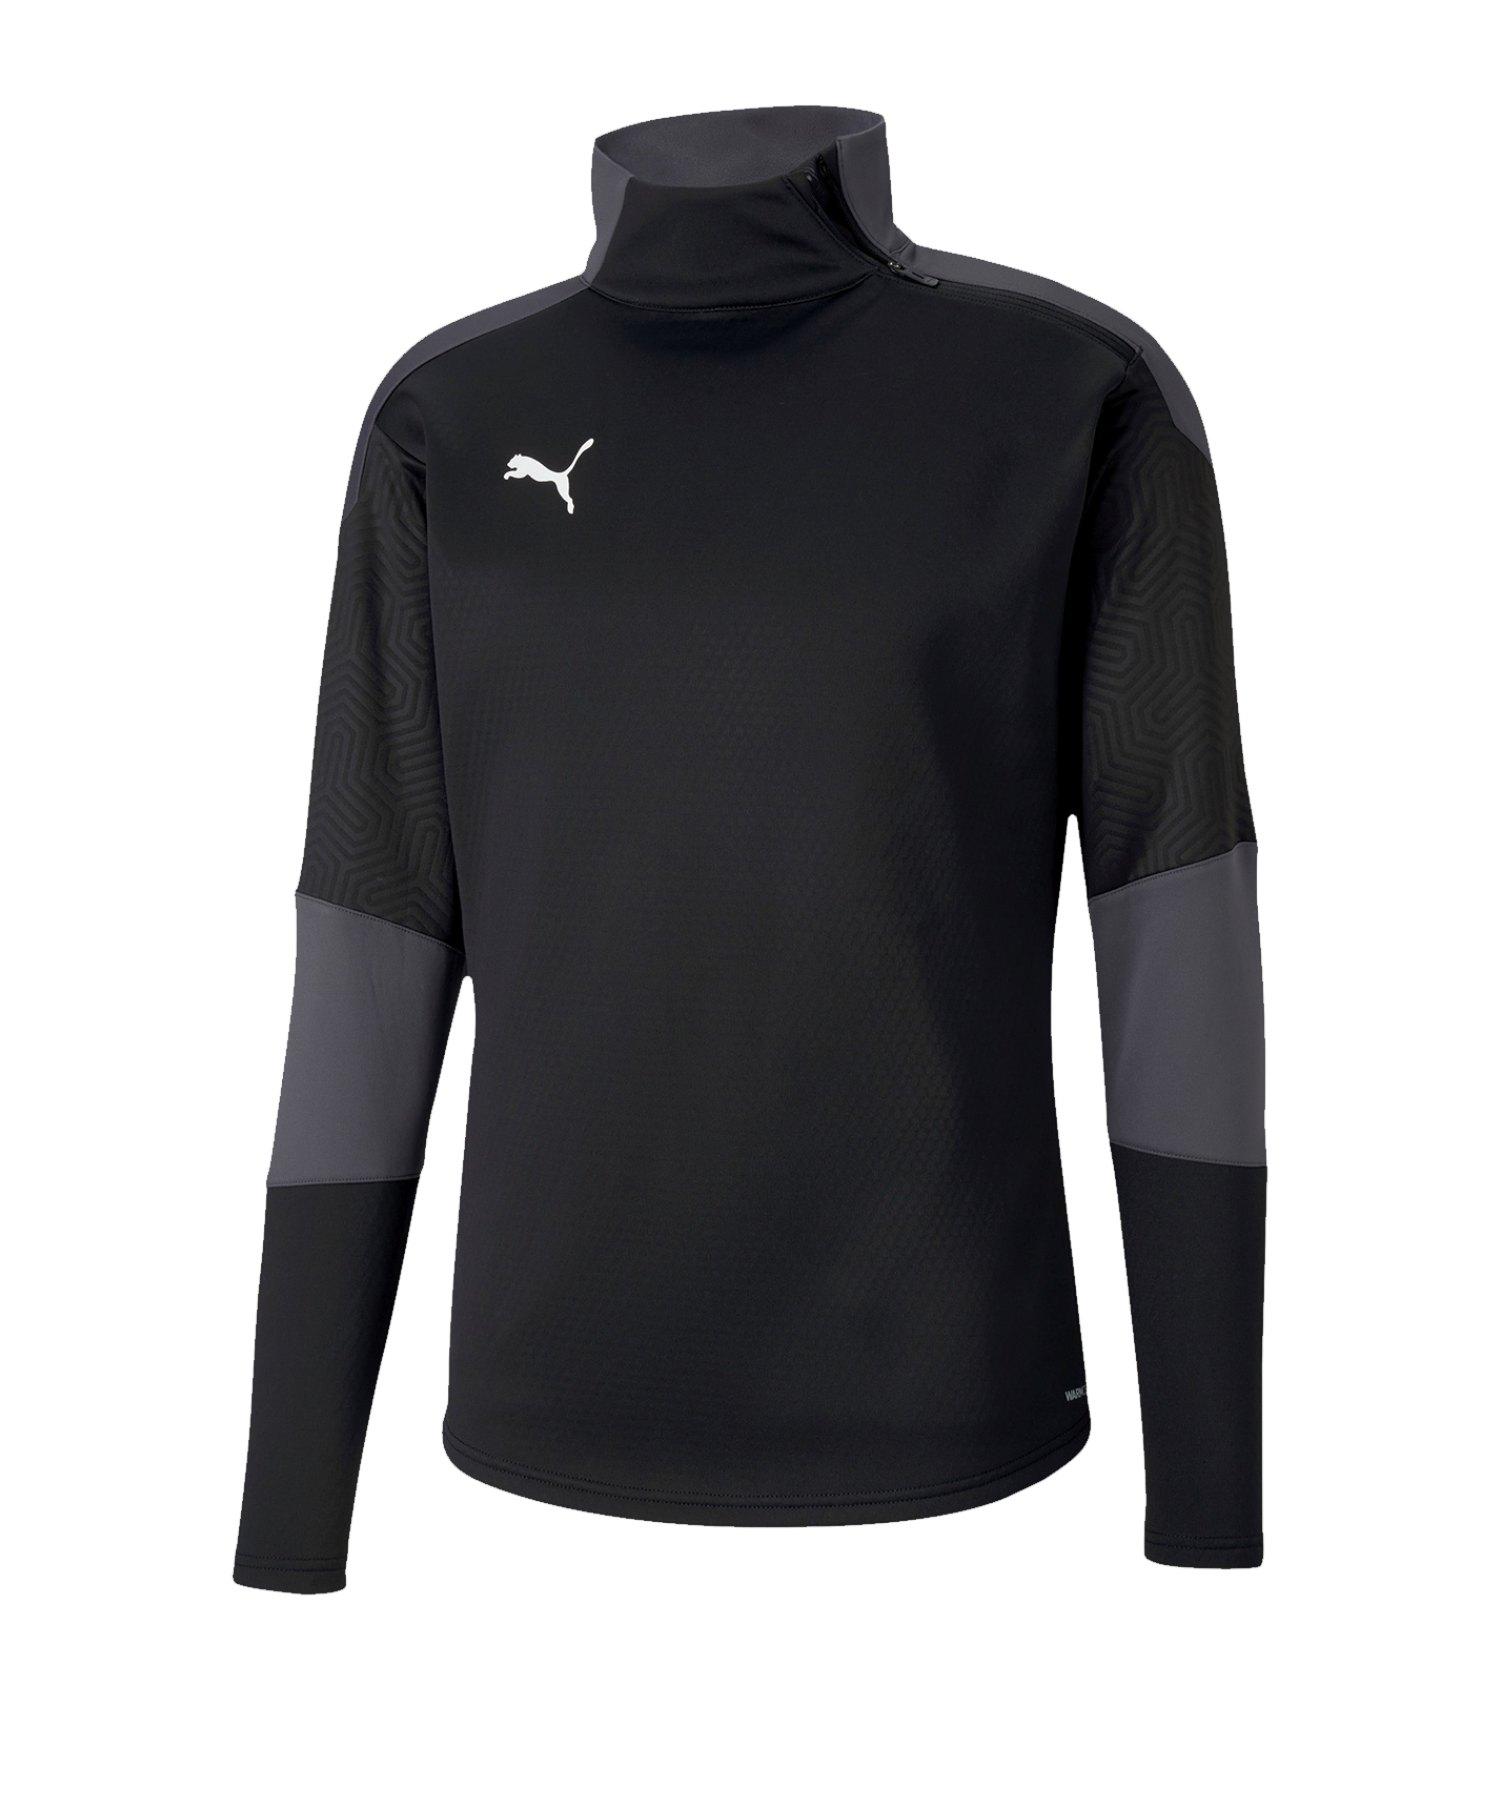 PUMA teamFinal 21 langarm Shirt Schwarz Grau F03 - schwarz